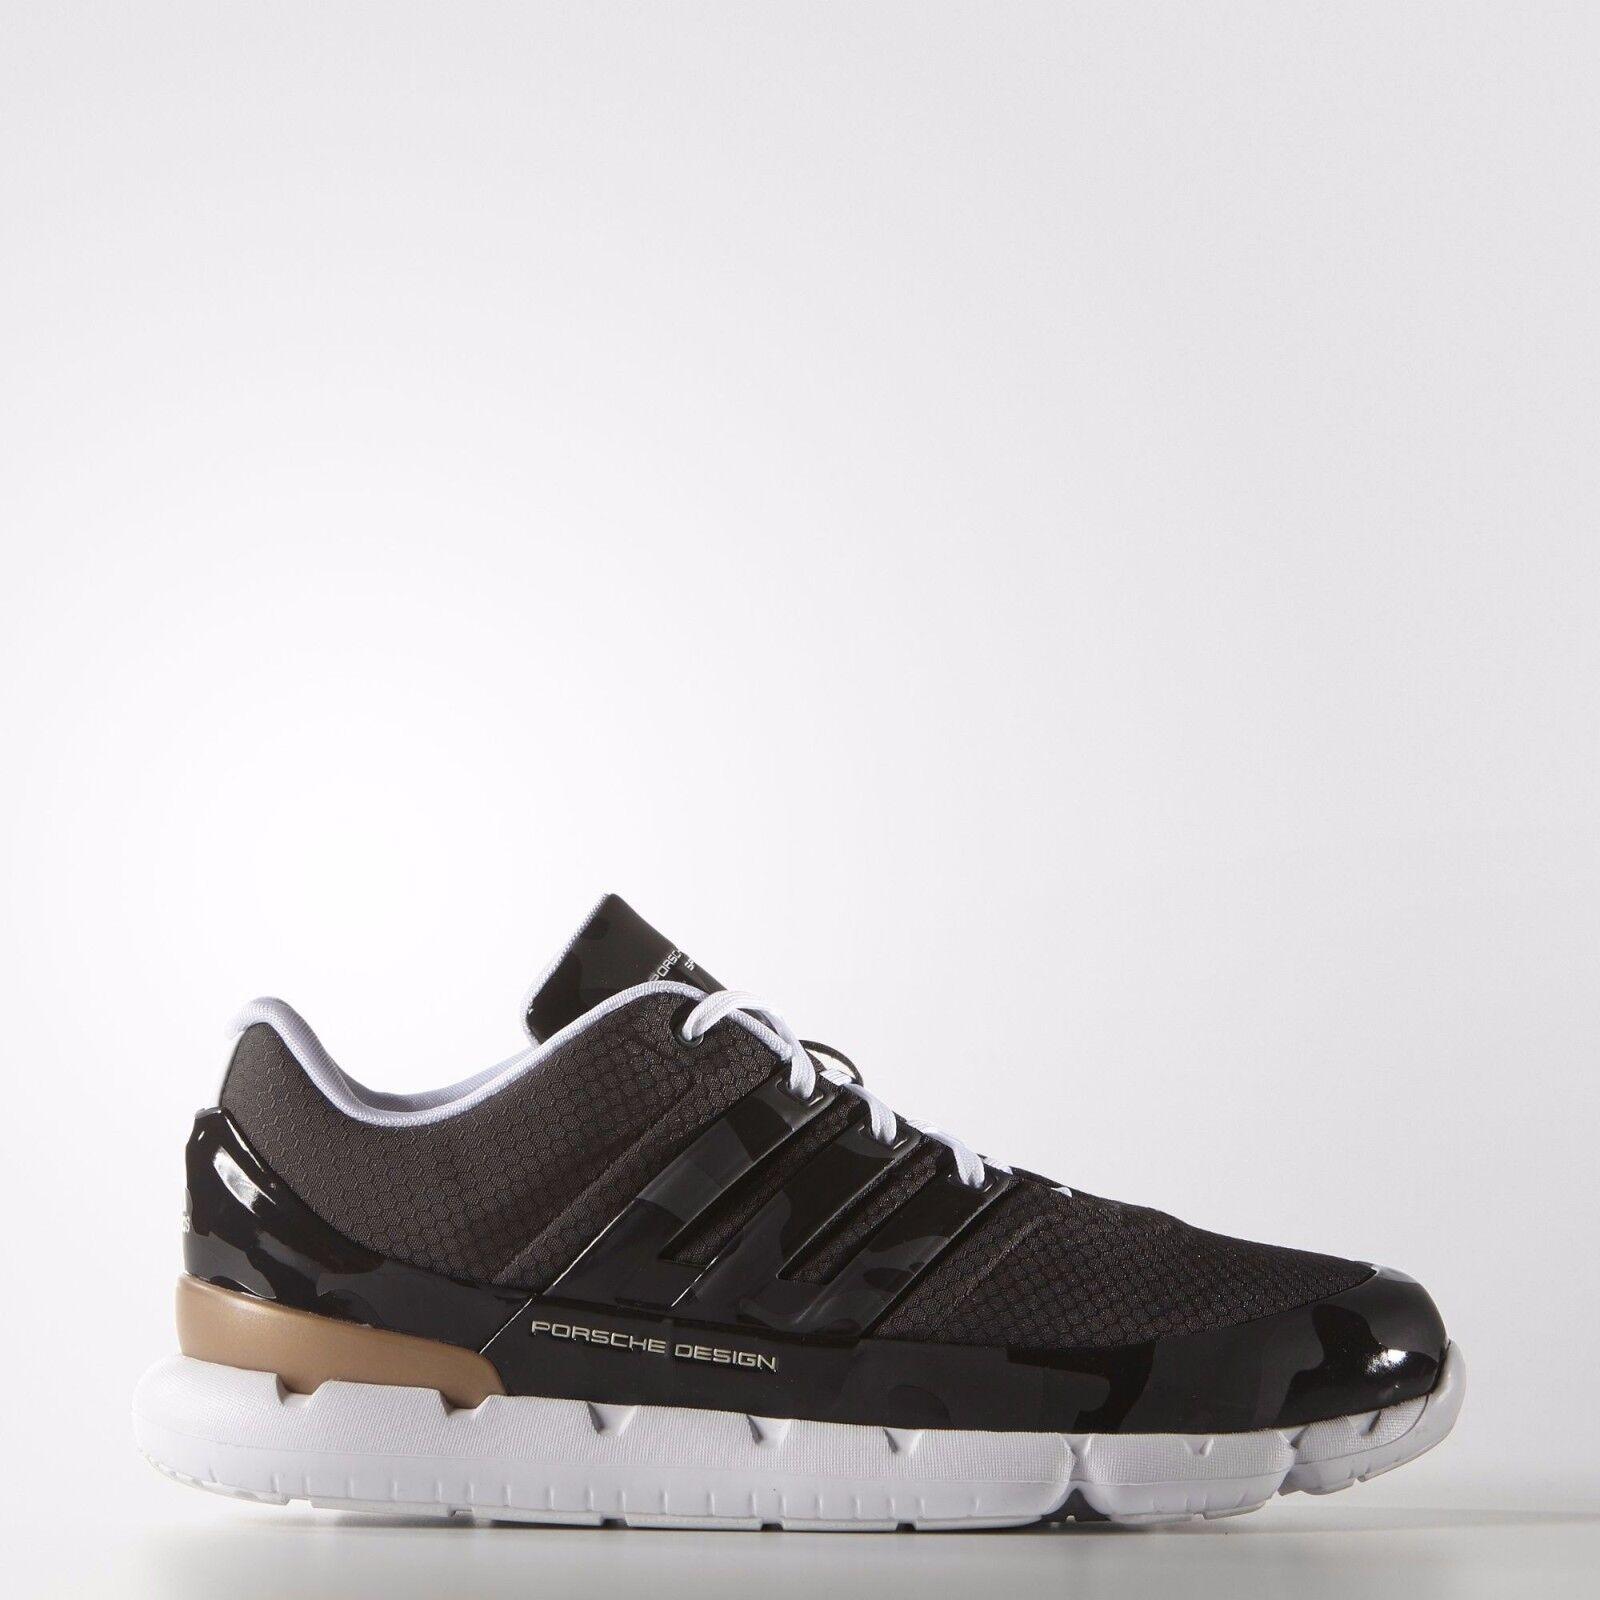 Adidas porsche design mens lauf sport schuhe schuhe schuhe bounce originale größe 11,5 10.5. 9. 94f95b